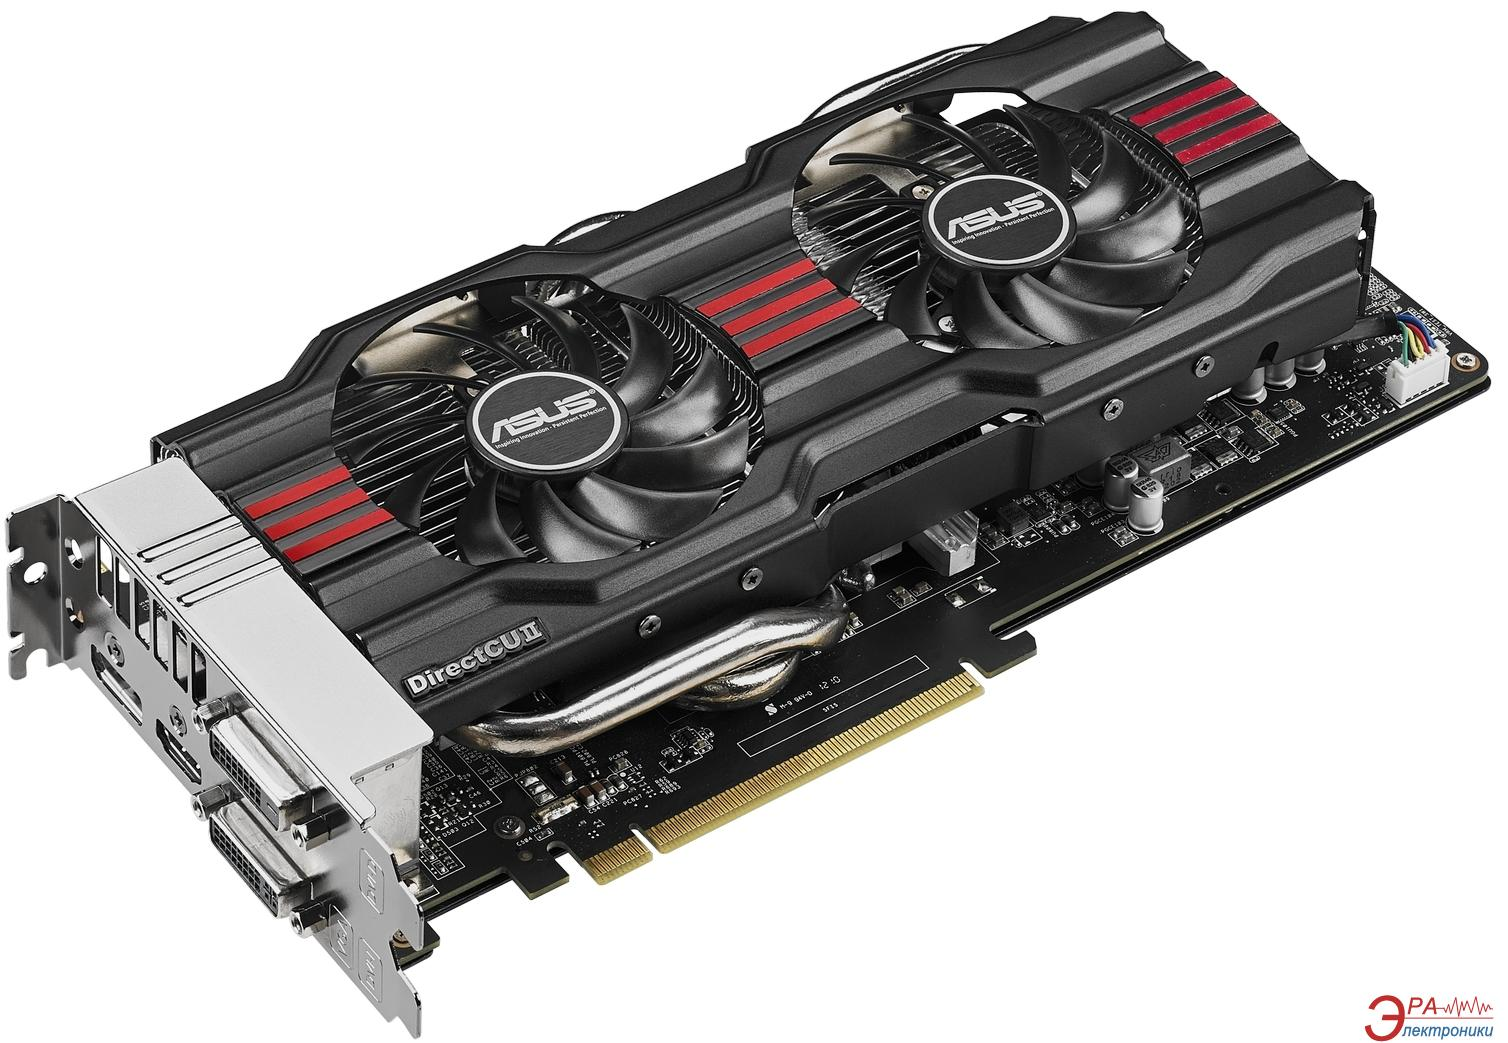 Видеокарта Asus Nvidia GeForce GTX 770 DirectCU II GDDR5 2048 Мб (GTX770-DC2-2GD5)